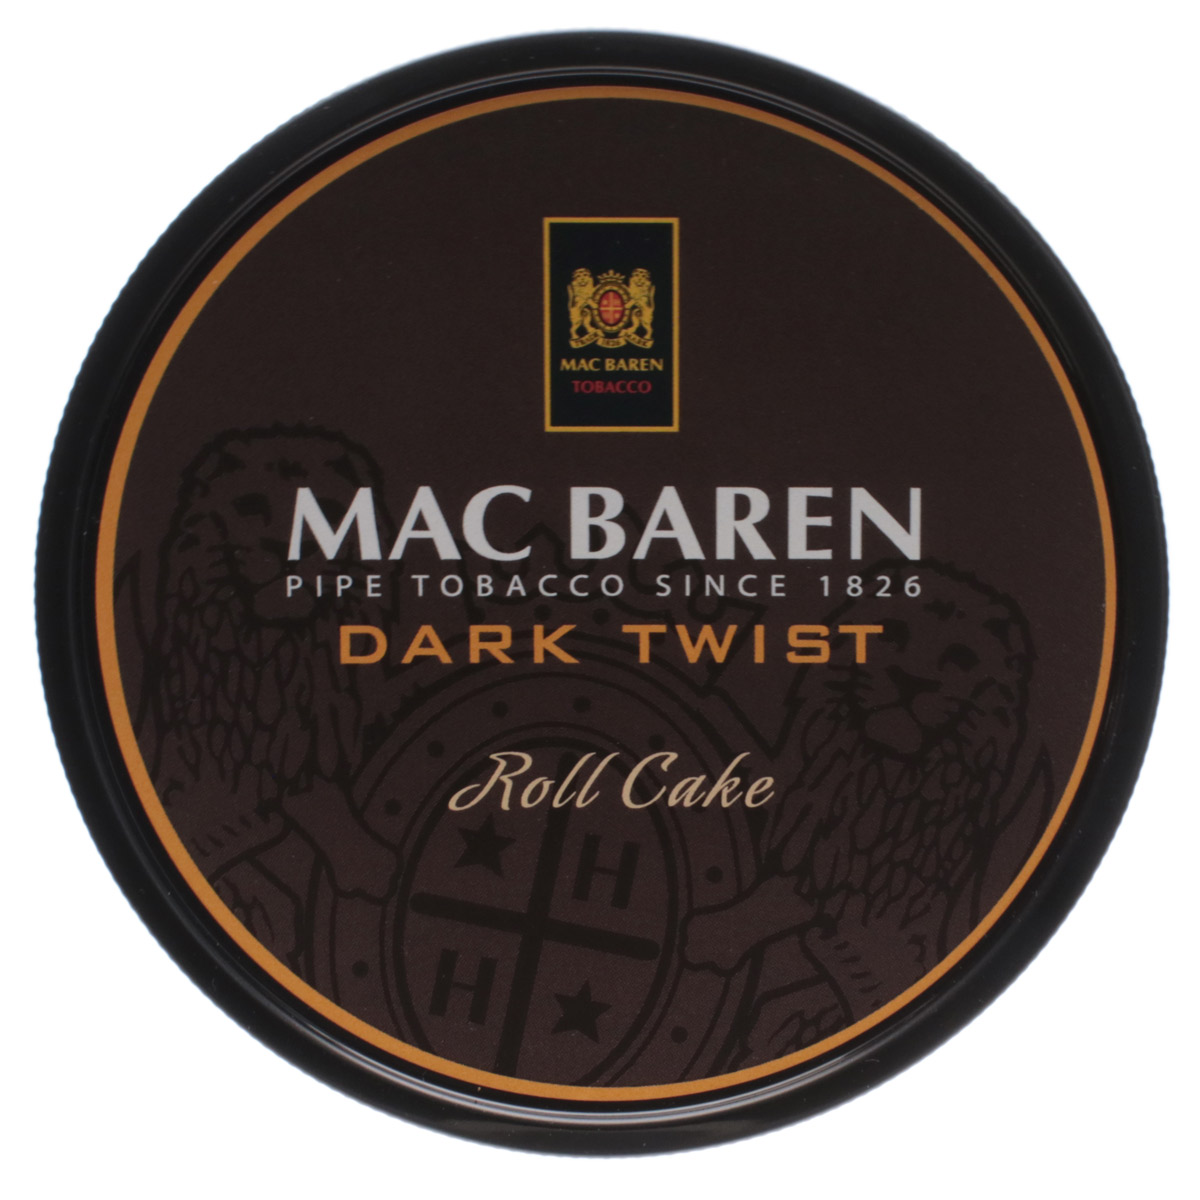 Mac Baren Dark Twist 3.5oz